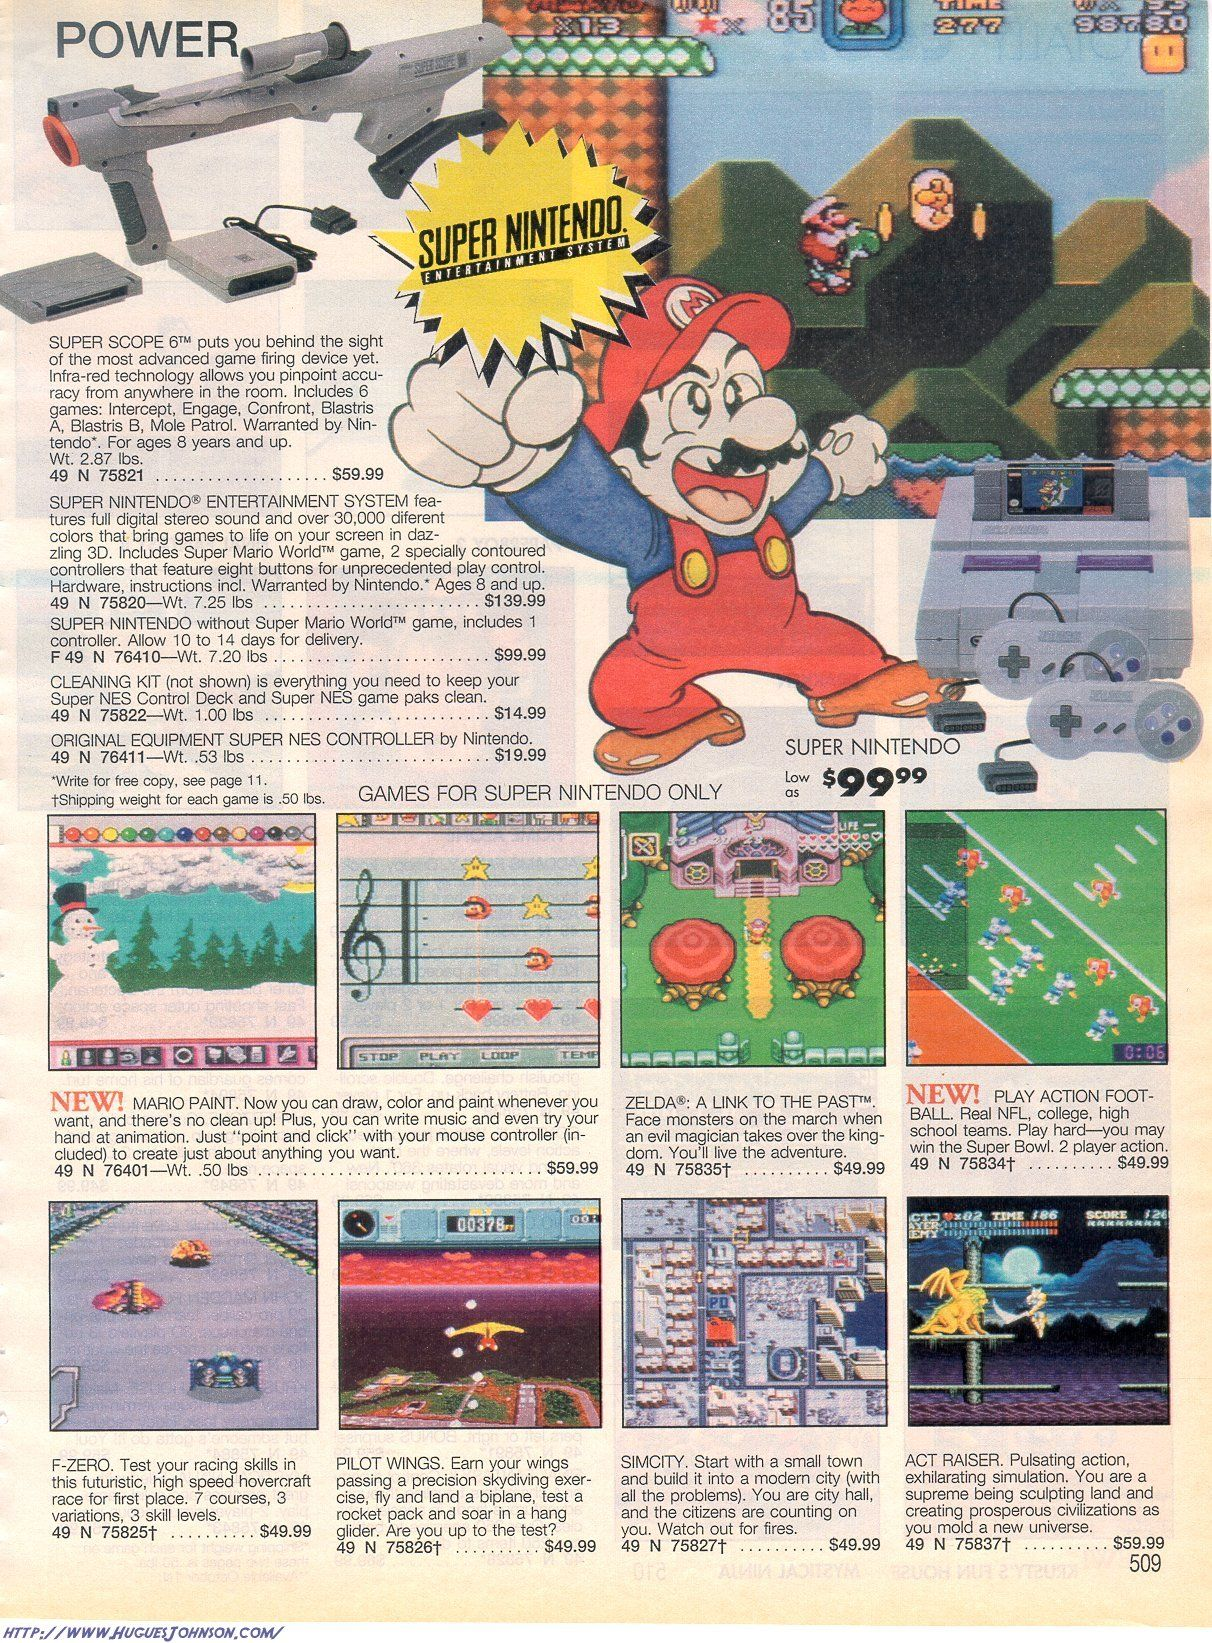 1992 Sears Catalog SNES ad | Gamer art | Pinterest | Games, Video ...